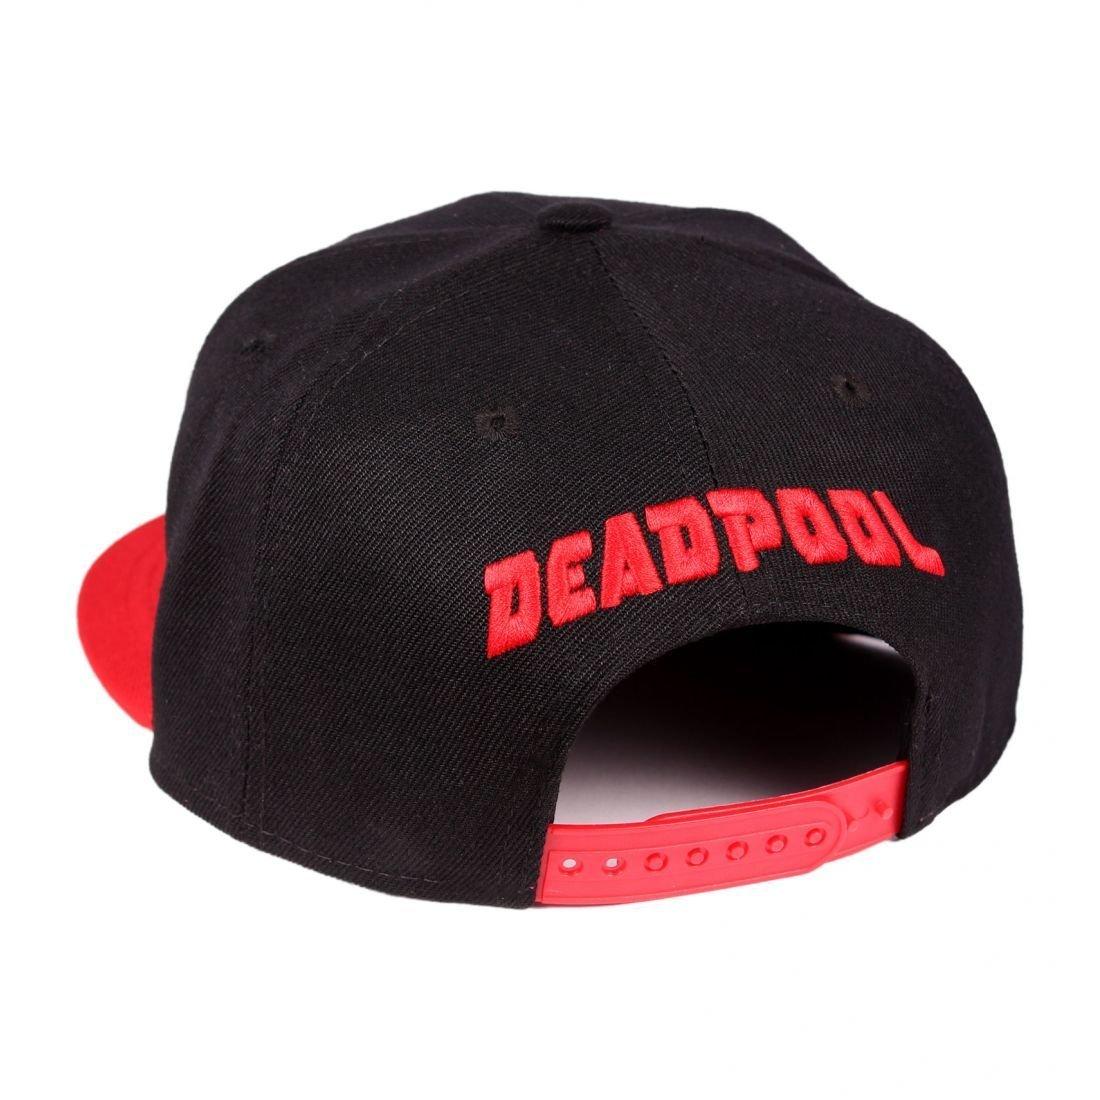 33bb9a94919 Marvel Deadpool Cap Snapback Black Onesize  Amazon.co.uk  Clothing